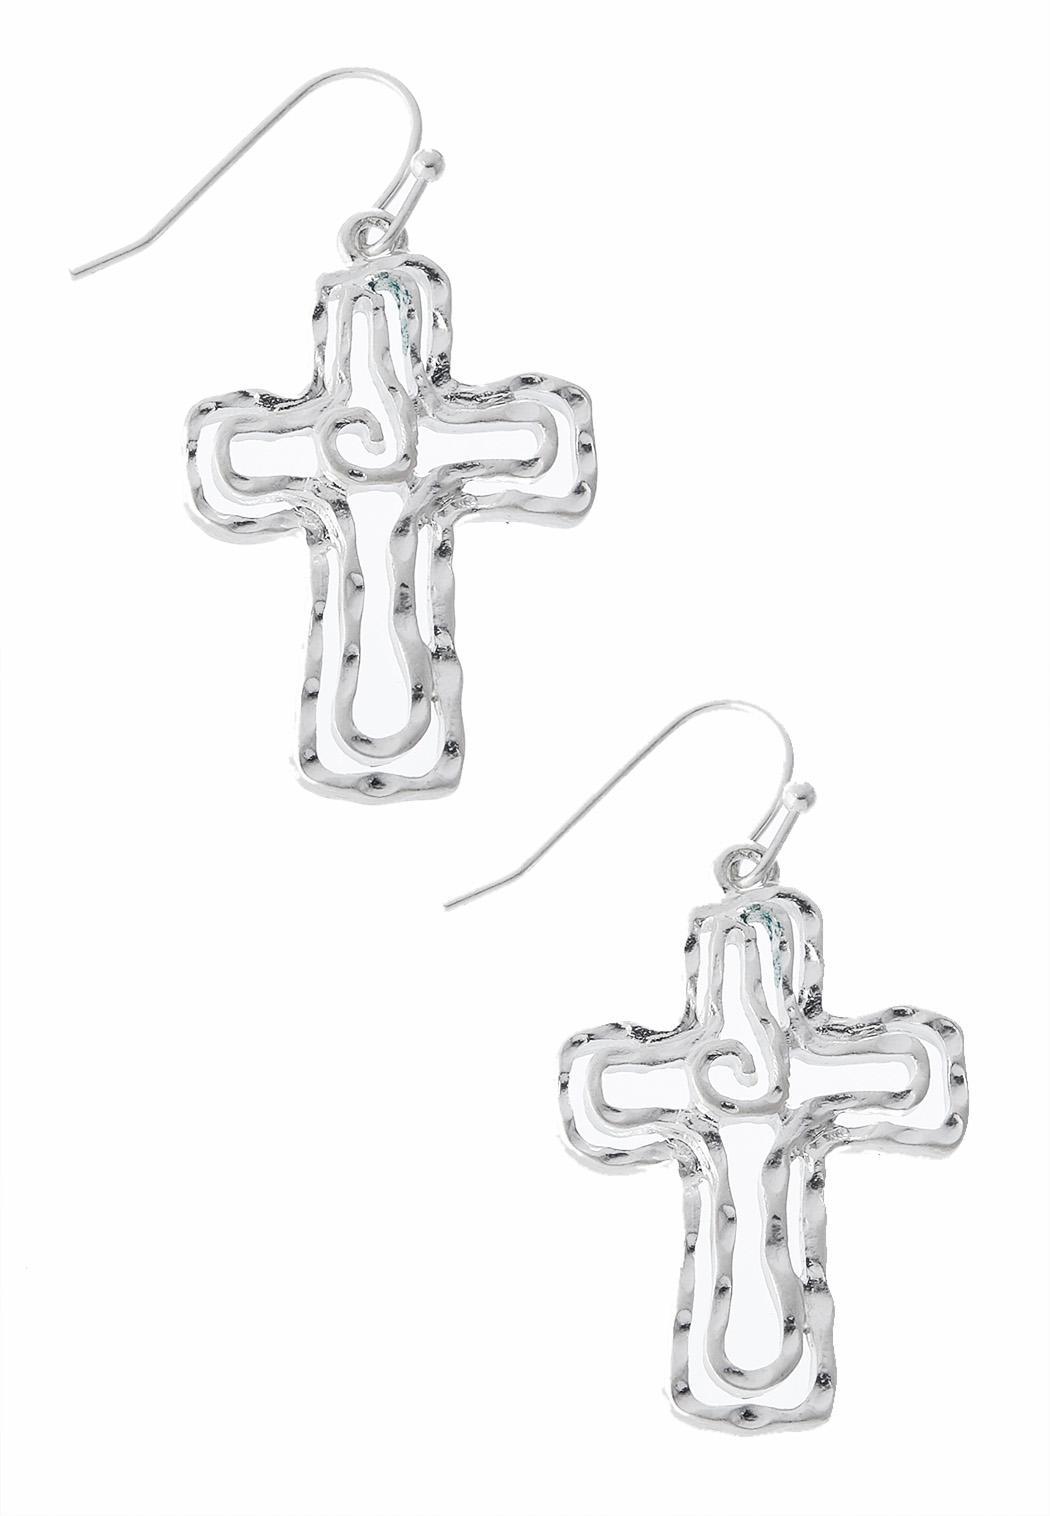 b2ee0a5971eac Cutout Cross Dangle Earrings Earrings Cato Fashions